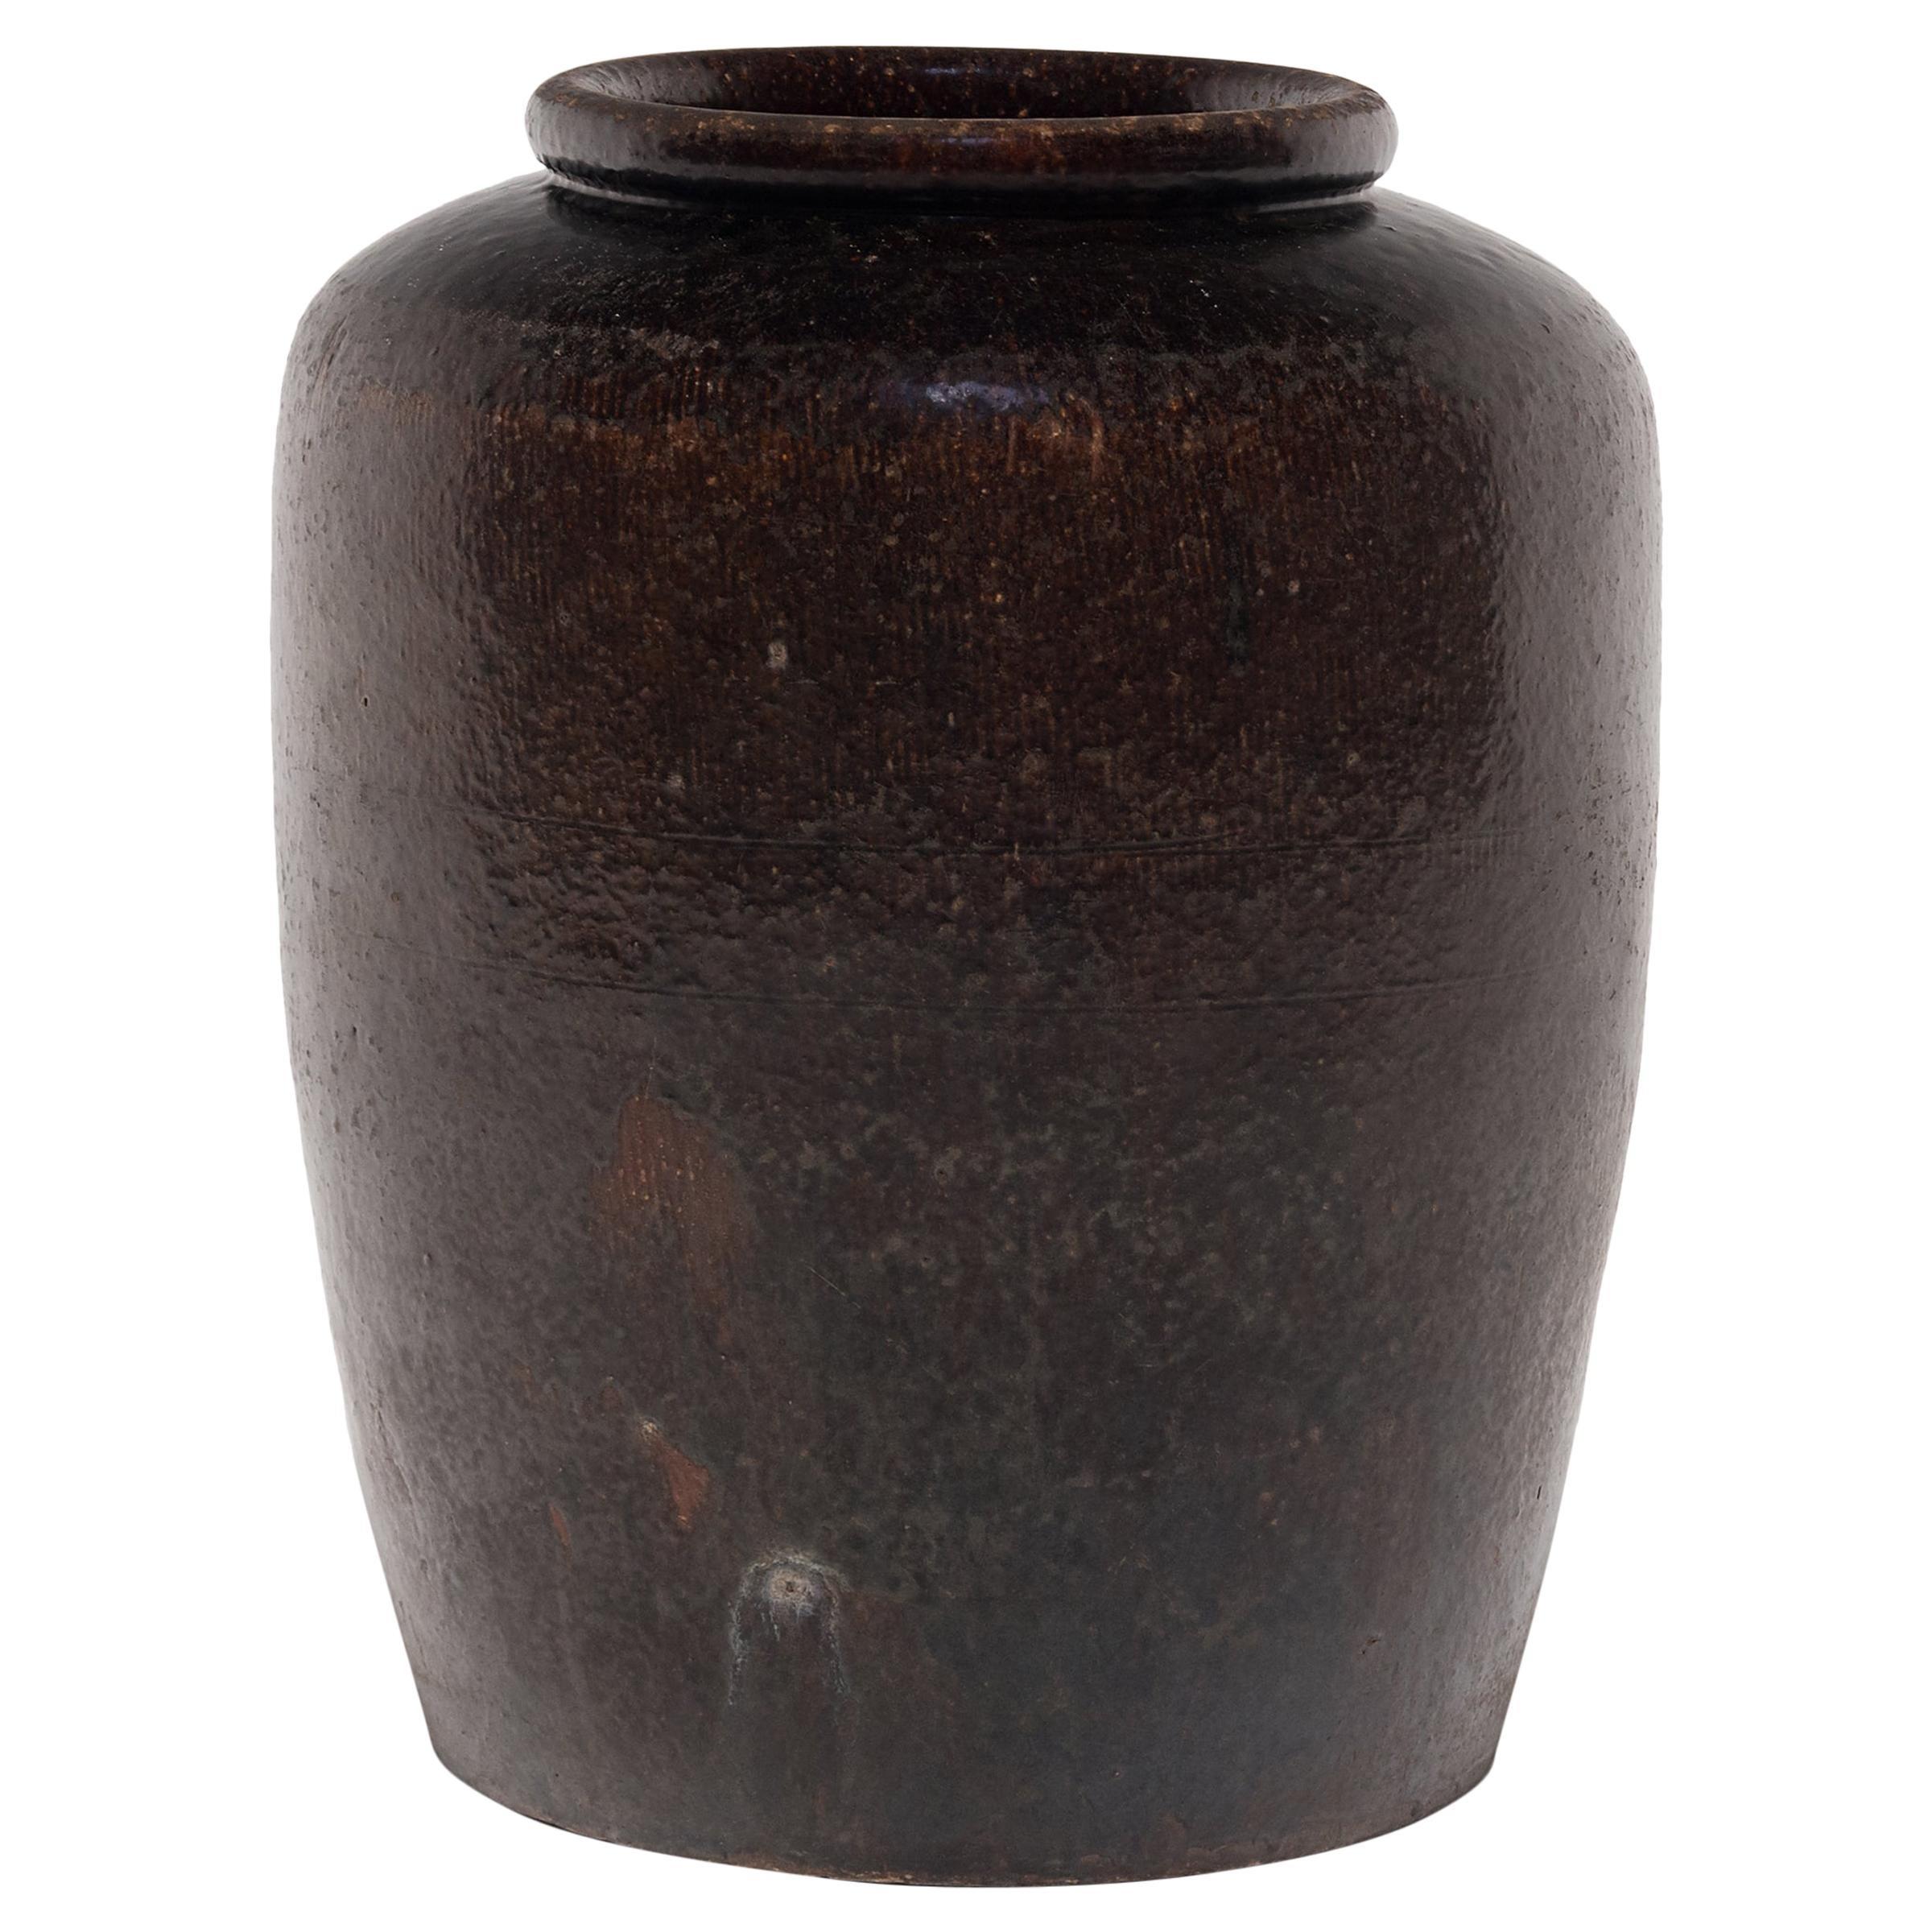 Chinese Dark Glazed Pickling Pot, circa 1900